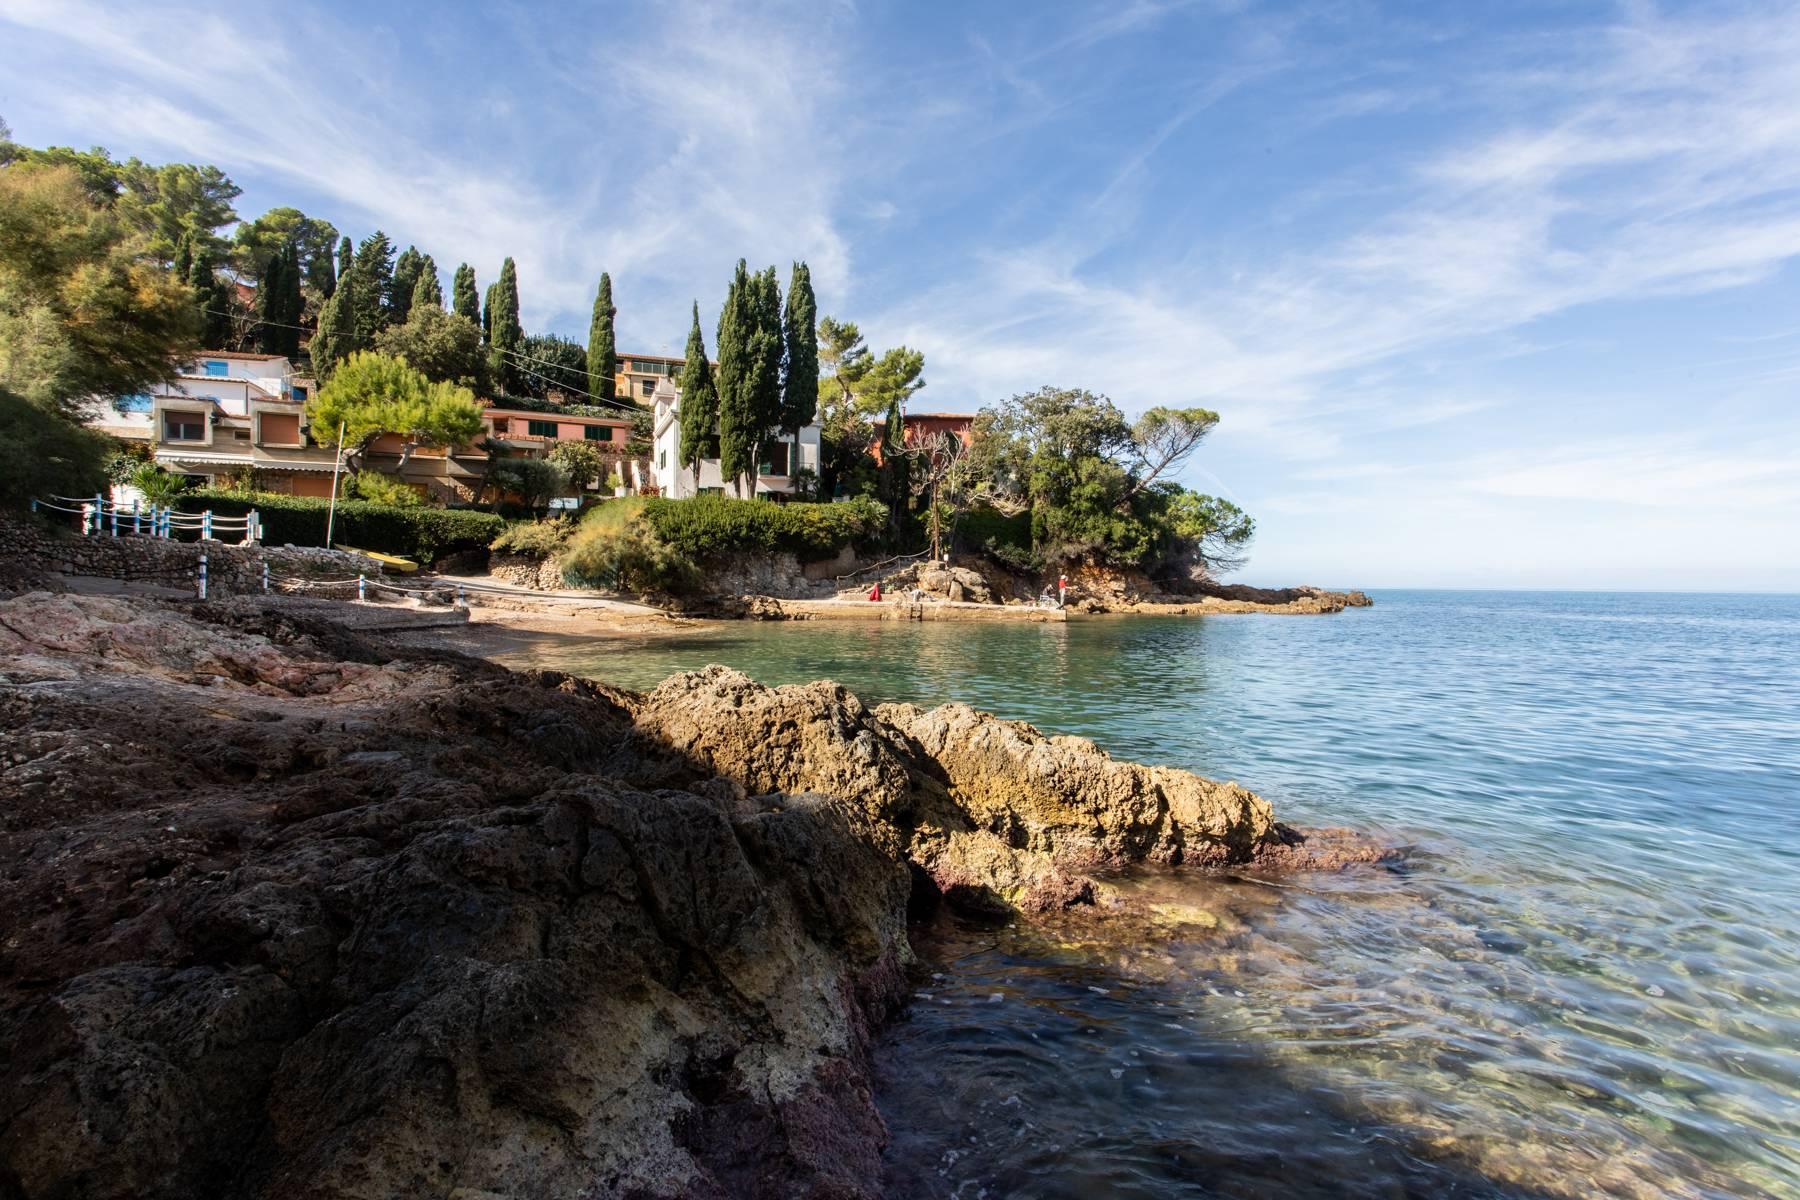 Incantevole villa pieds dans l'eau all'Argentario - 13